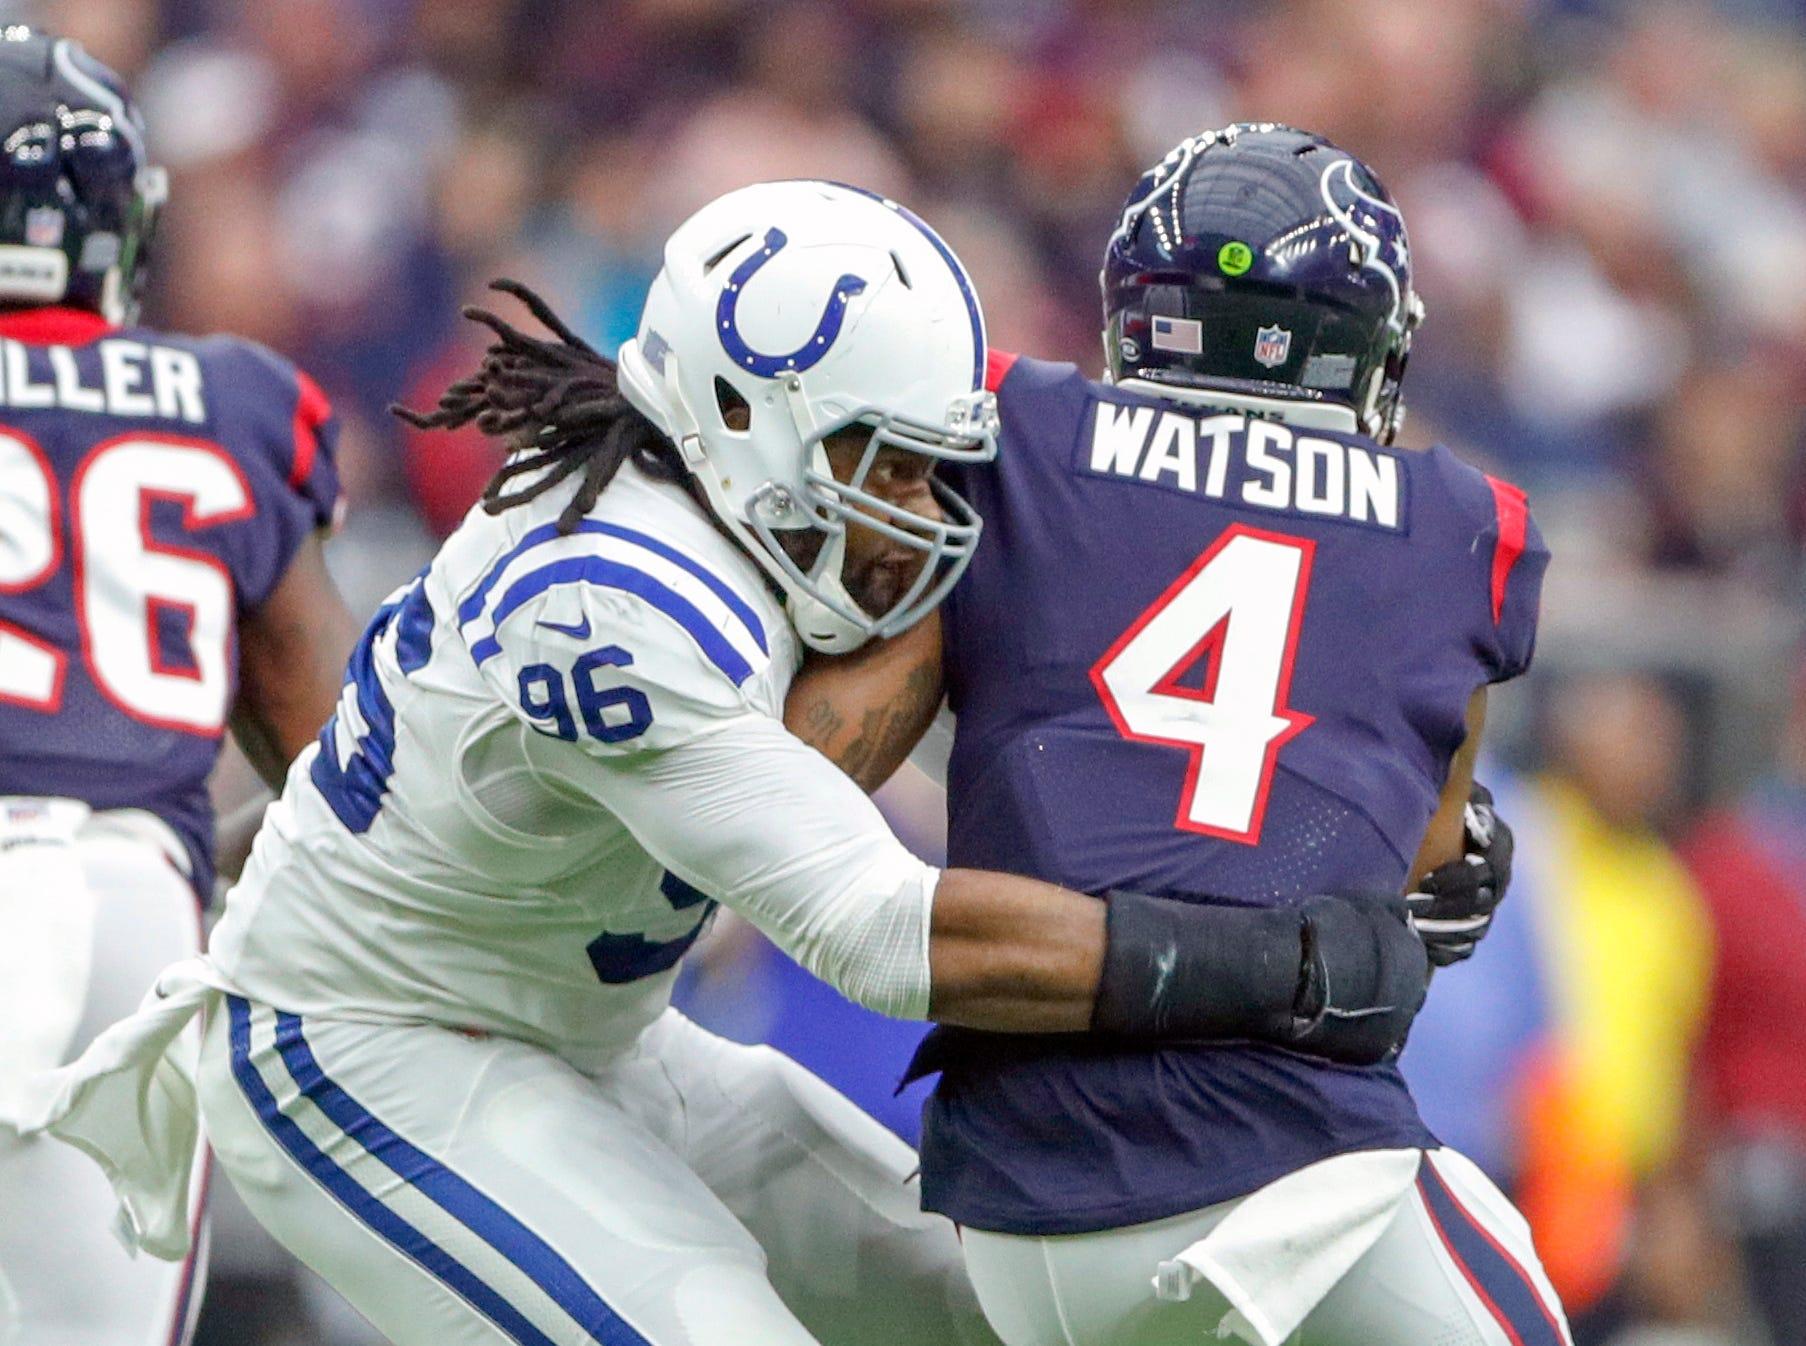 Indianapolis Colts defensive tackle Denico Autry (96) sacks Houston Texans quarterback Deshaun Watson (4) at NRG Stadium in Houston on Sunday, Dec. 9, 2018.